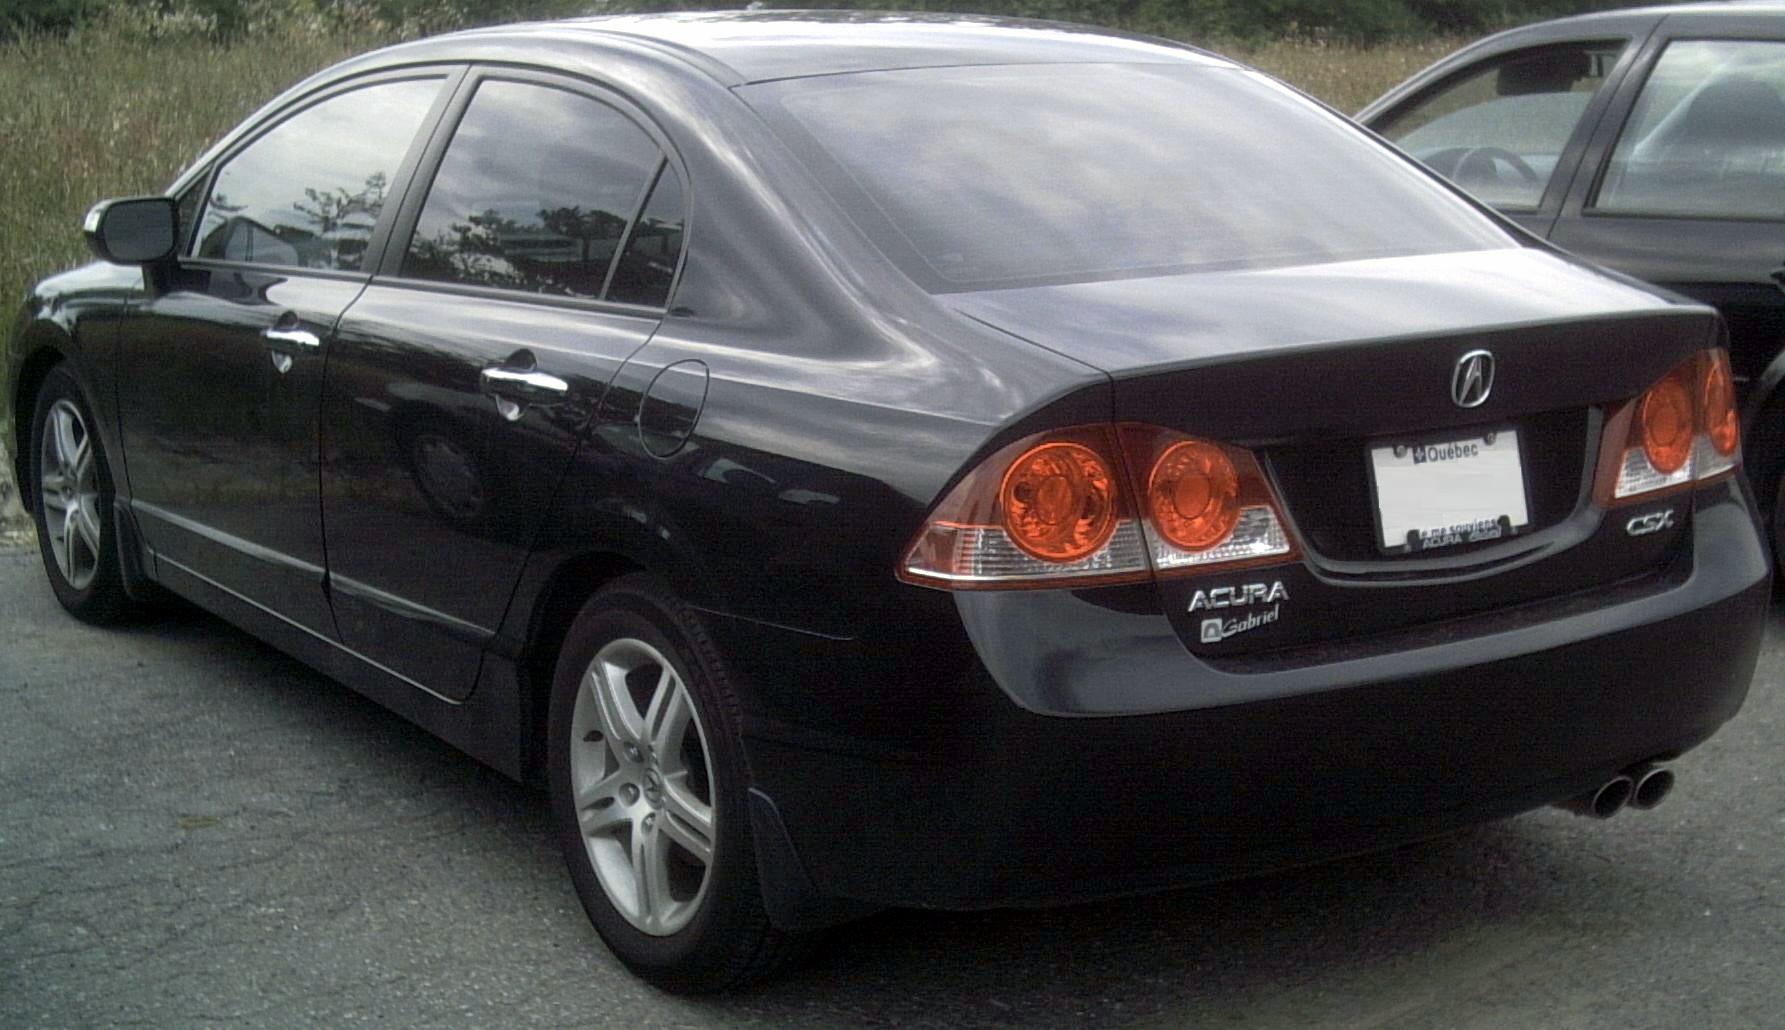 Acura CSX 2005 - 2011 Sedan #3